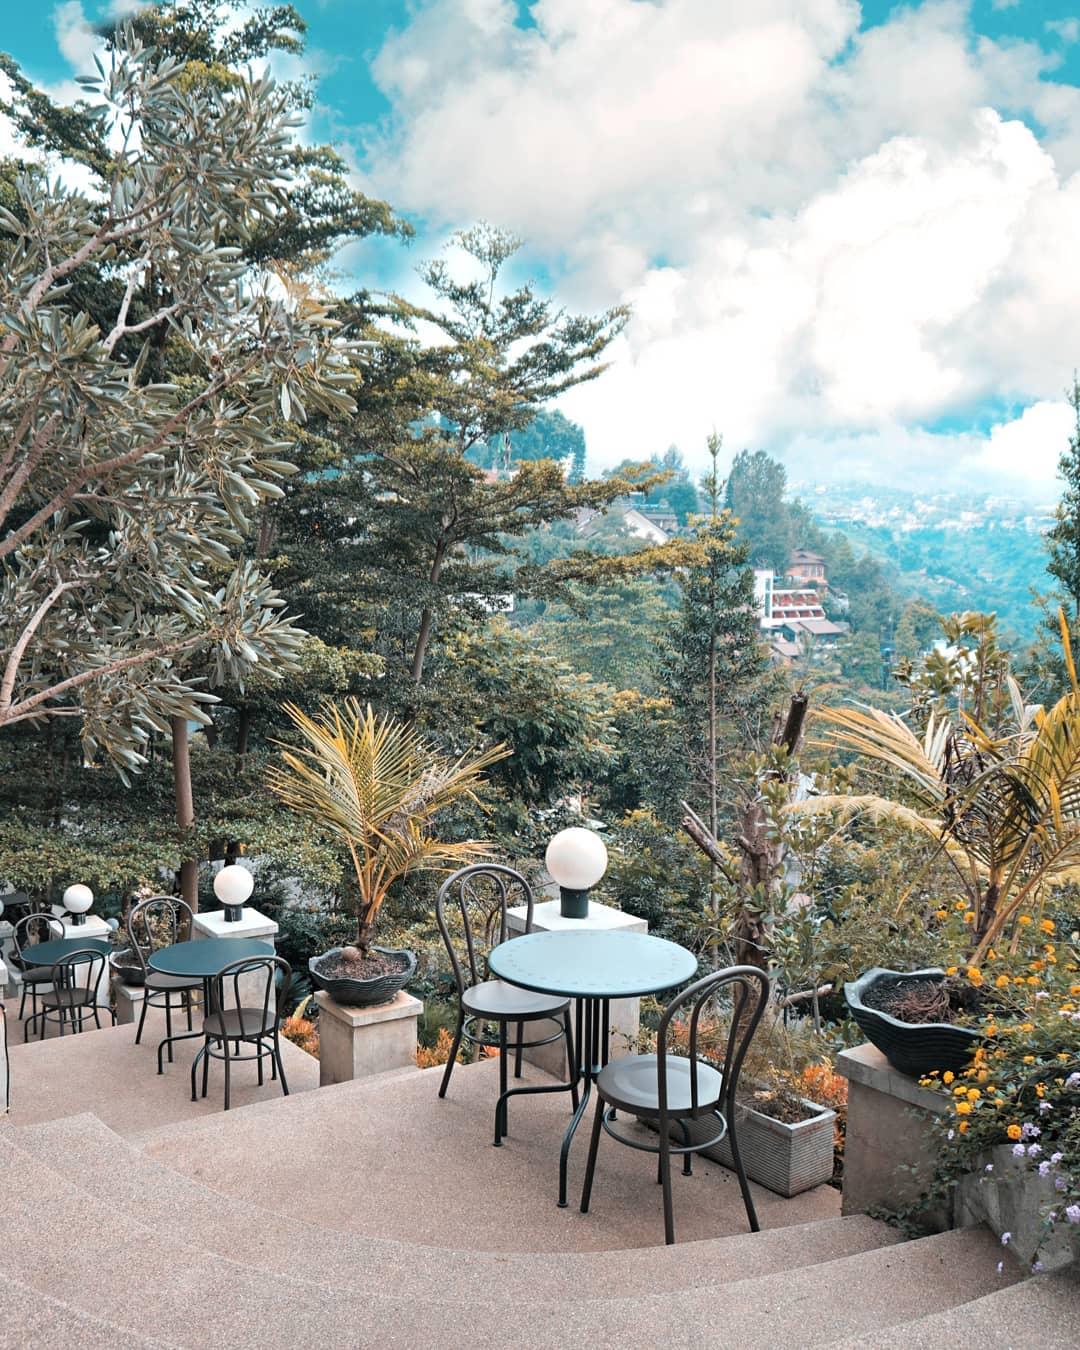 Pemandangan Di Lokasi Cafe Image From @kopibawahpohoncafe